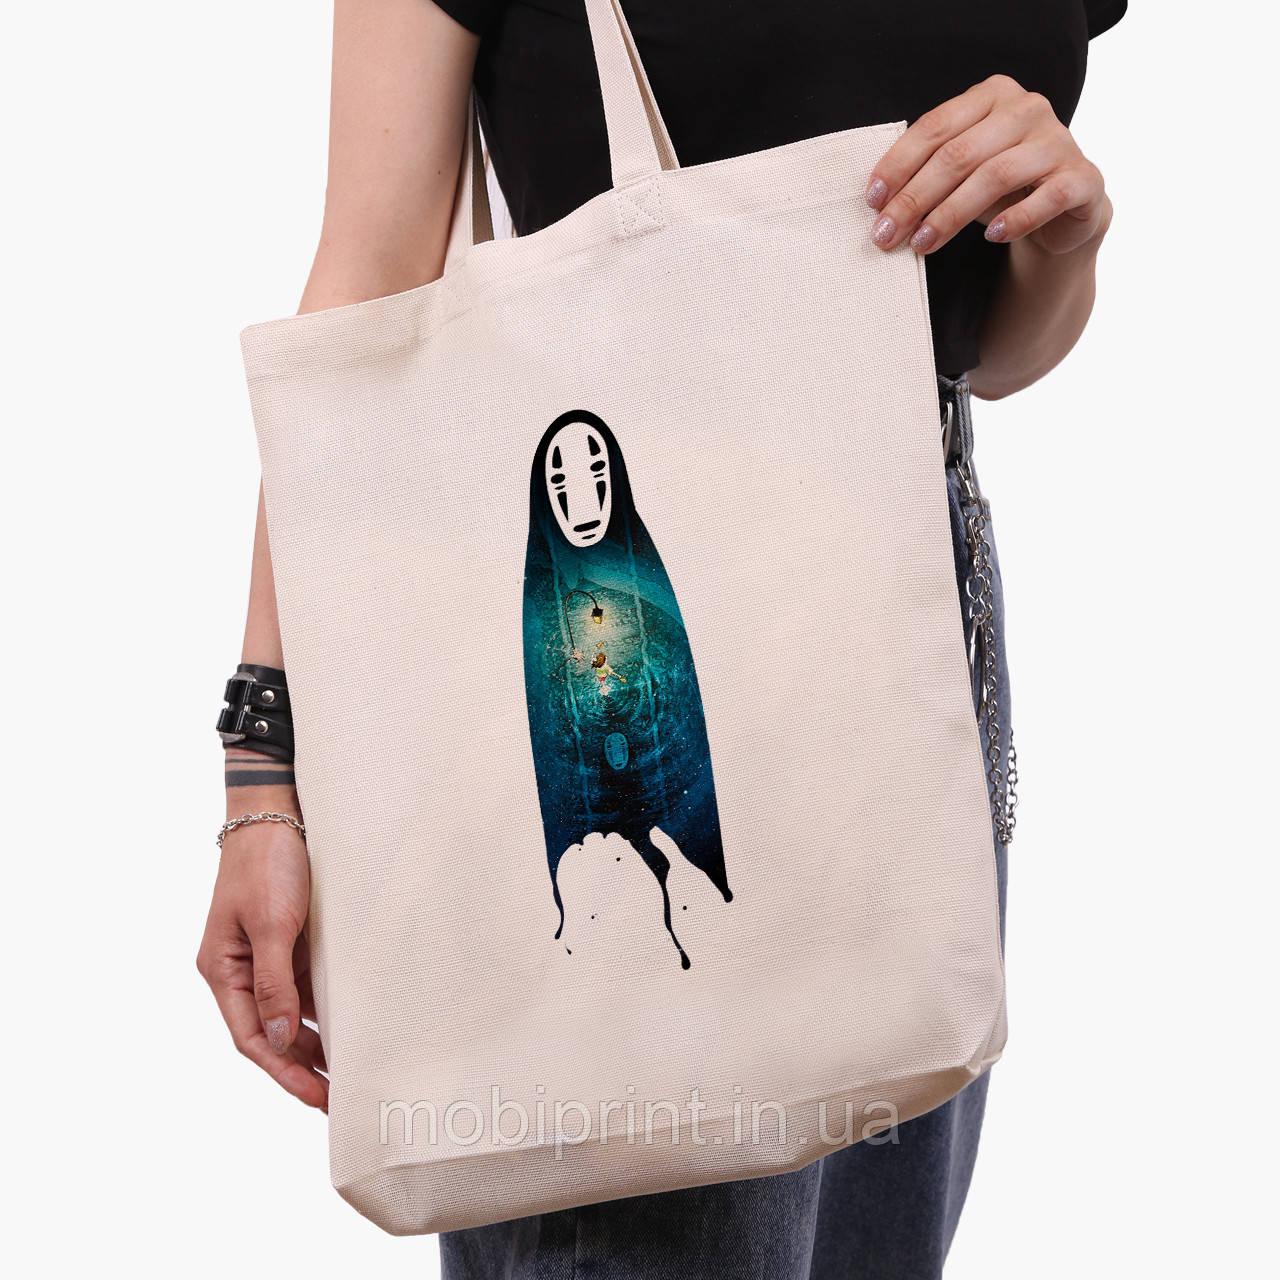 Еко сумка шоппер біла Безликий Бог Каонасі Віднесені примарами (Spirited Away) (9227-2831-1) 41*39*8 см